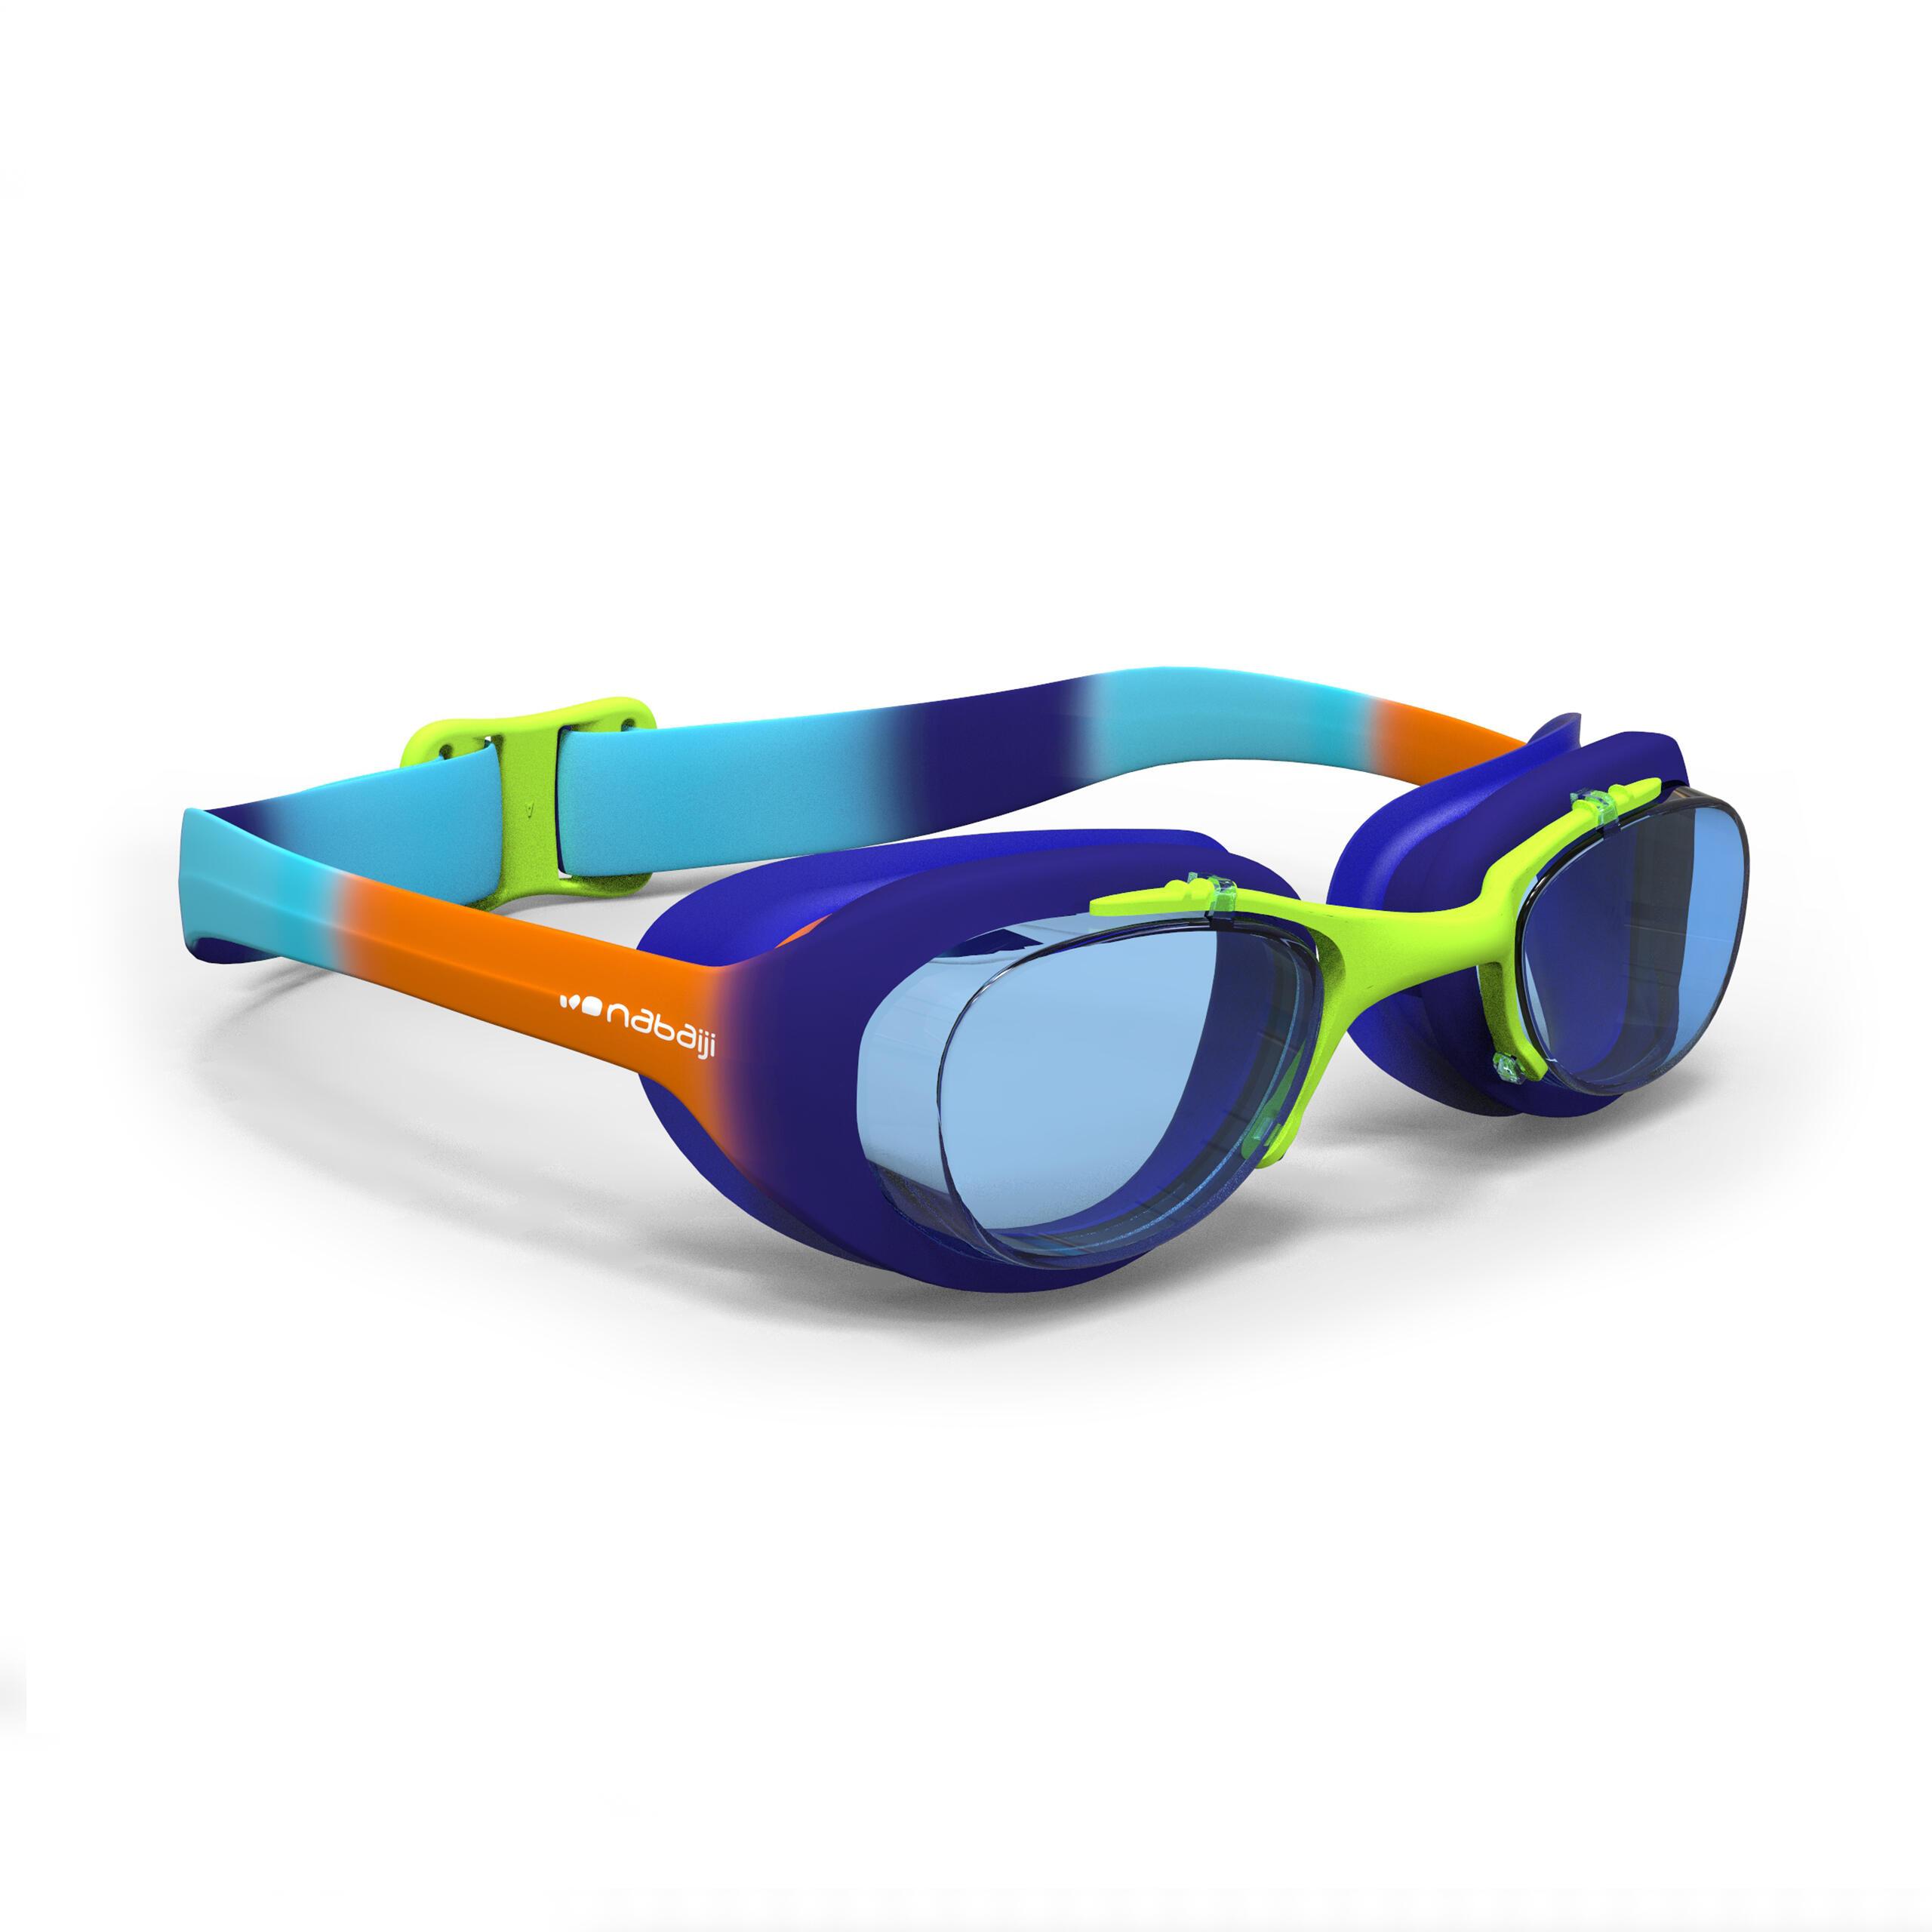 Ochelari Înot 100 Xbase S imagine